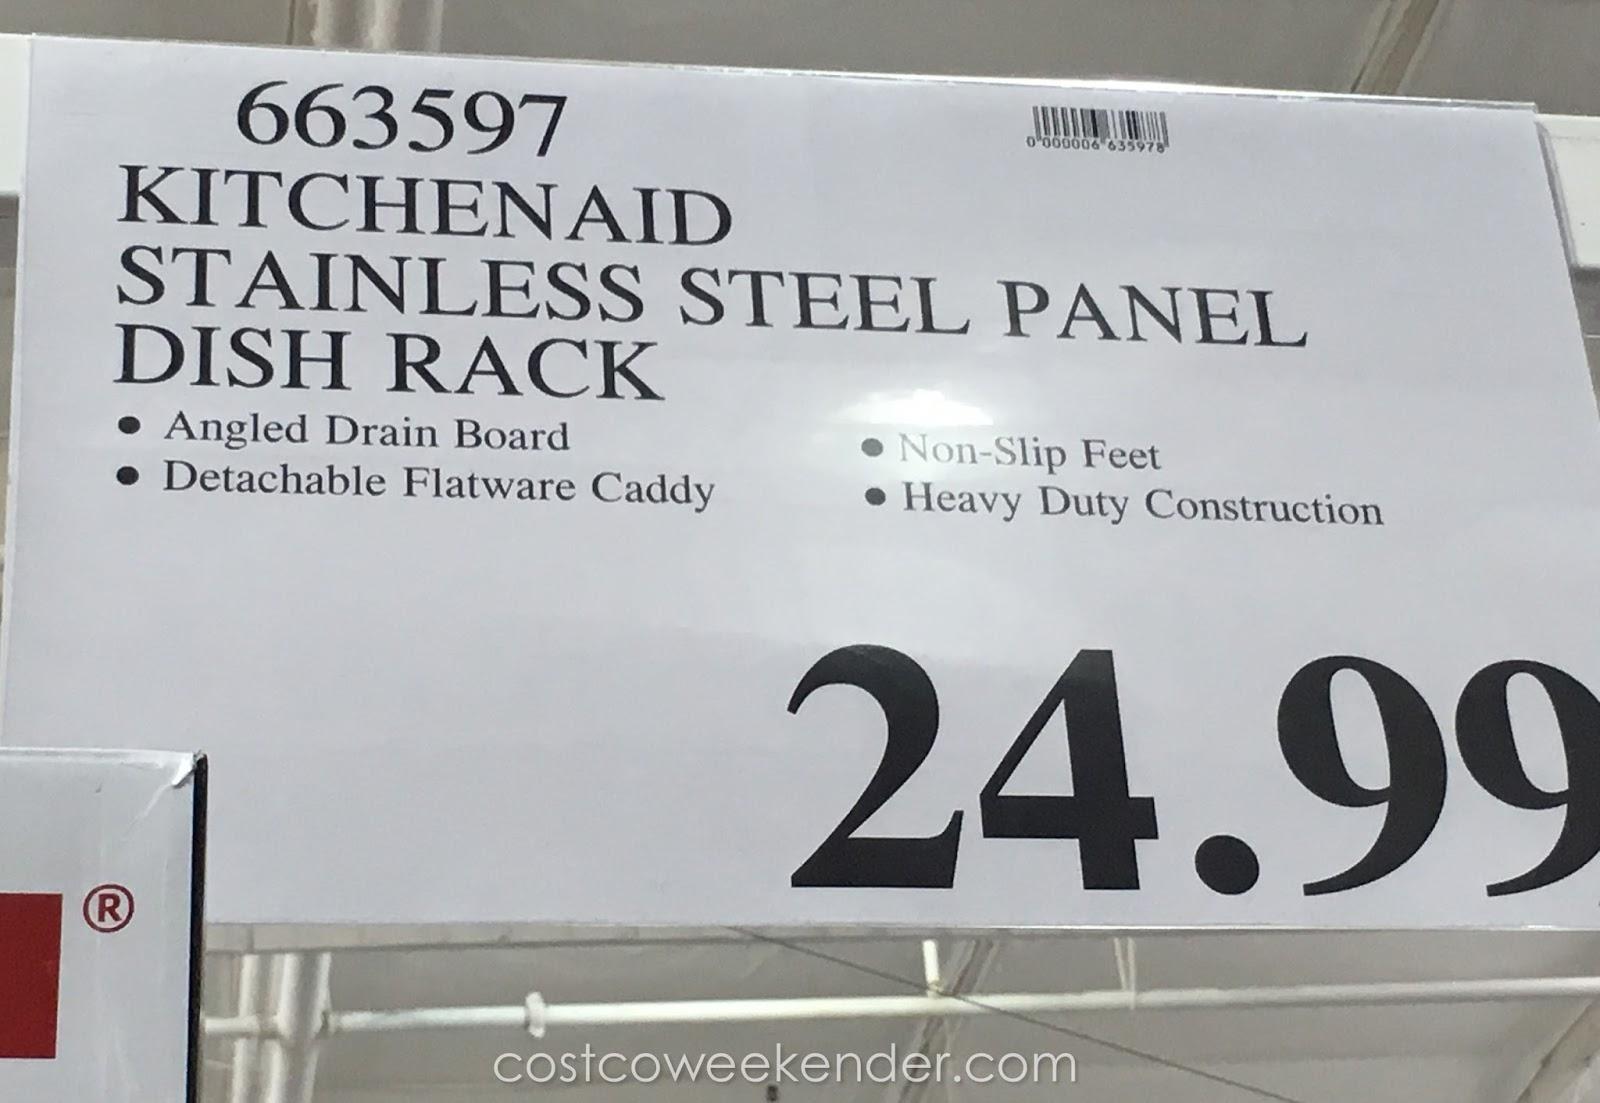 Kitchenaid Stainless Steel Dish Drying Rack Costco Weekender